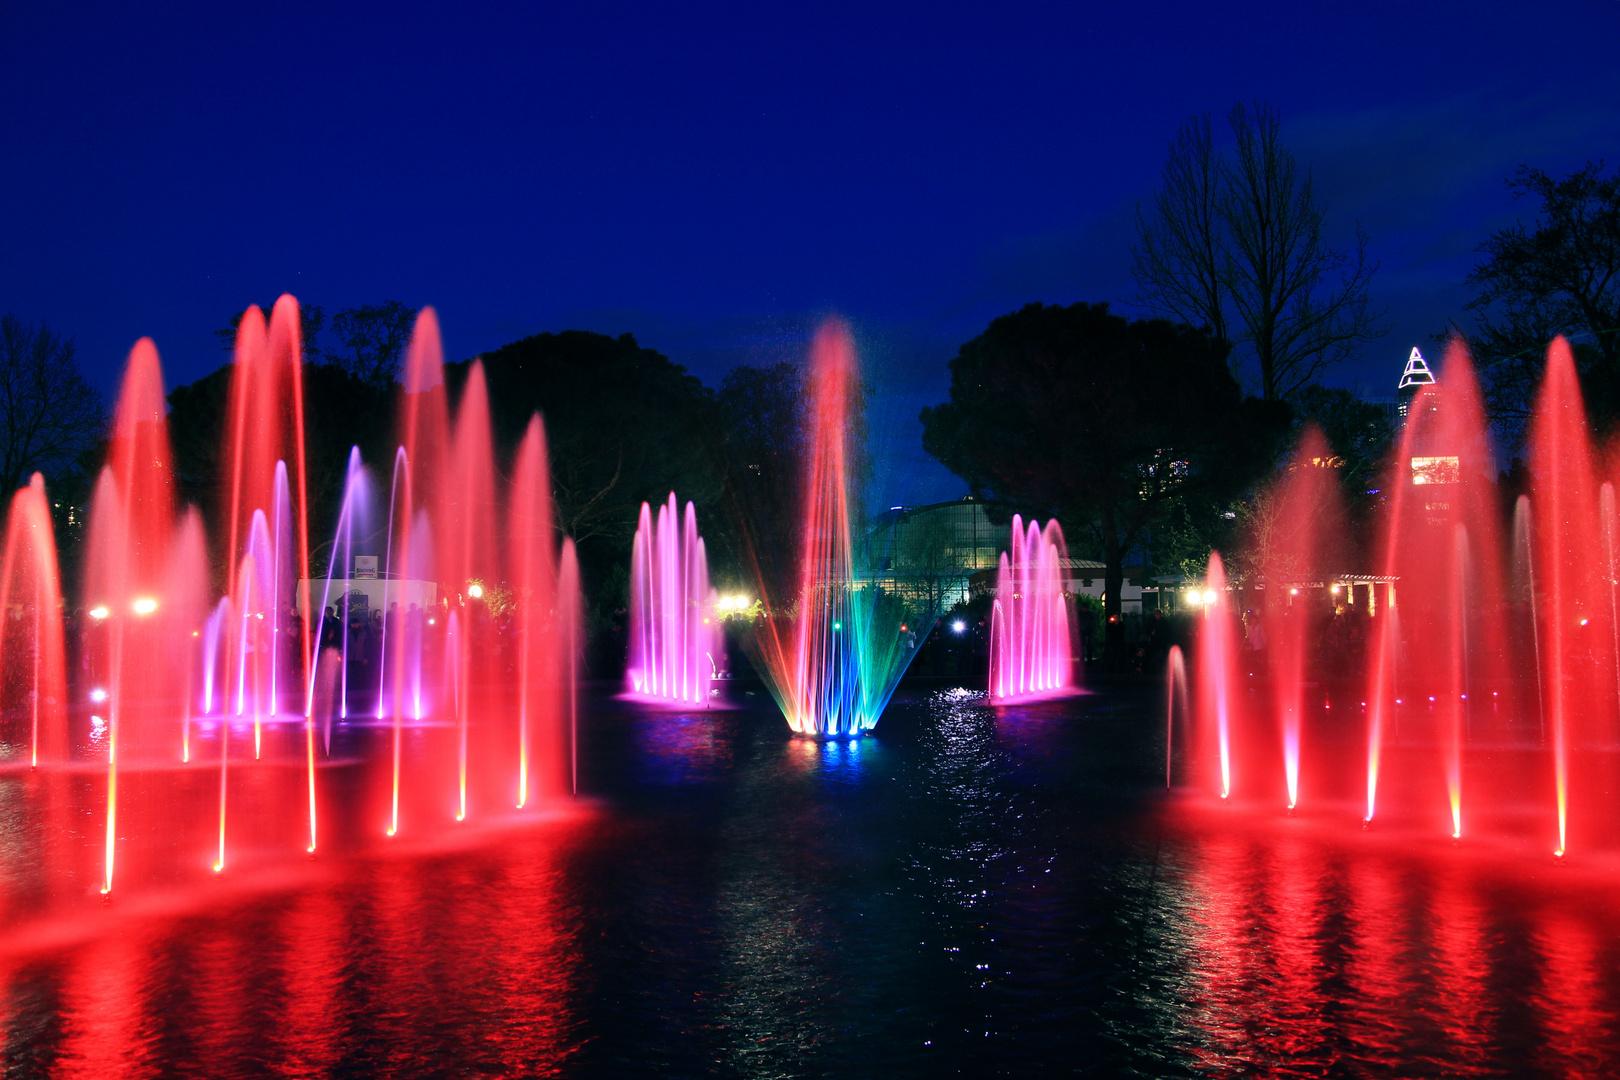 Oktogonbrunnen im Palmengarten Frankfurt zur Luminale 2012